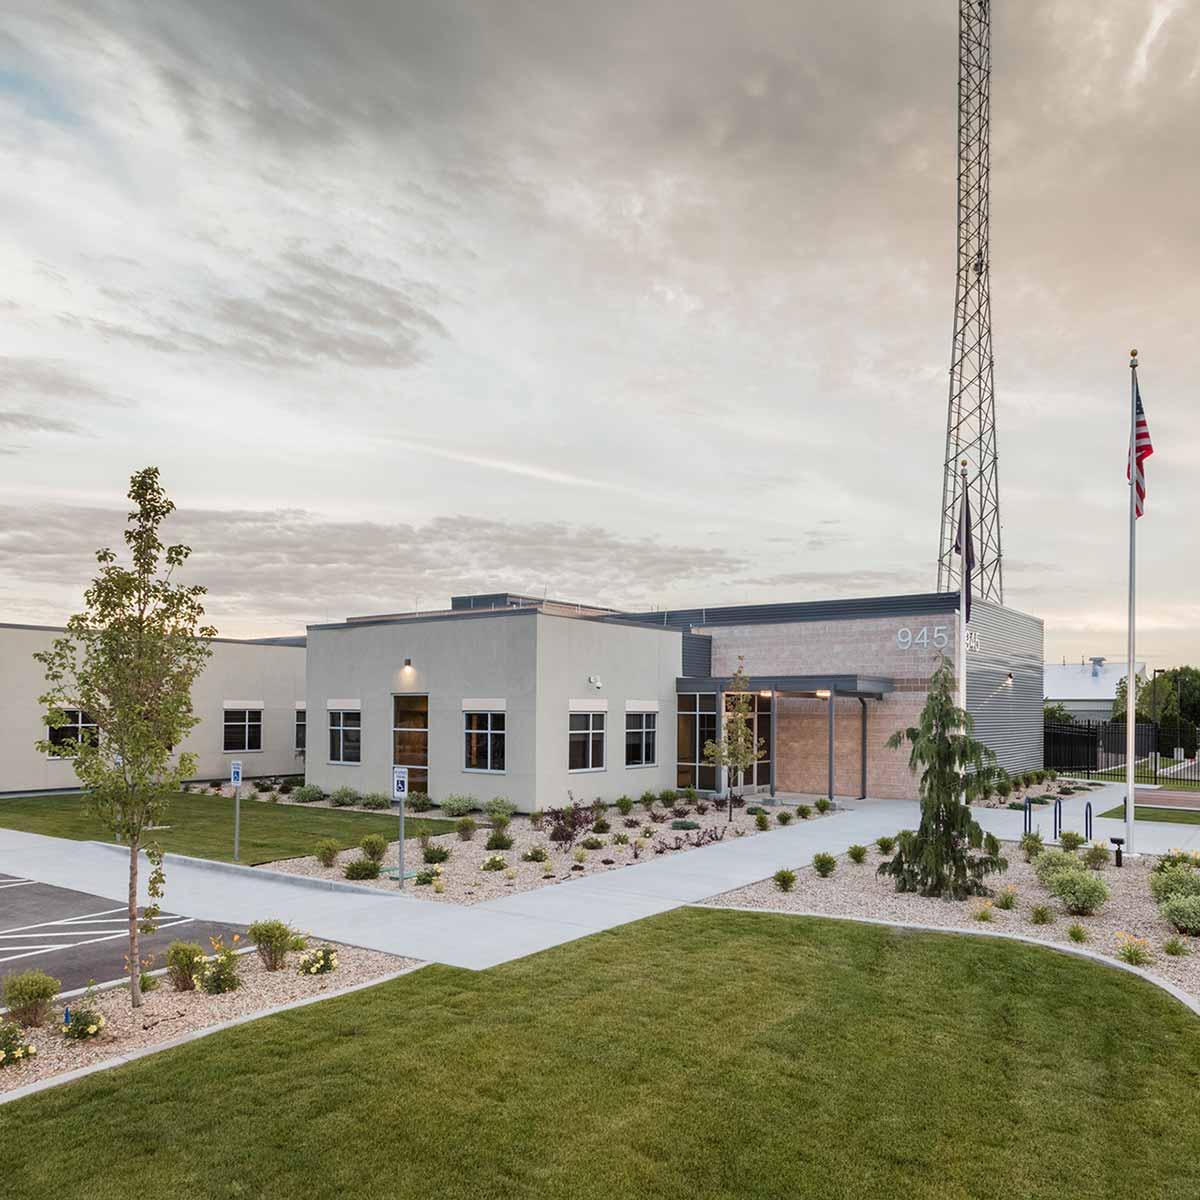 Ada County 911 Dispatch Center